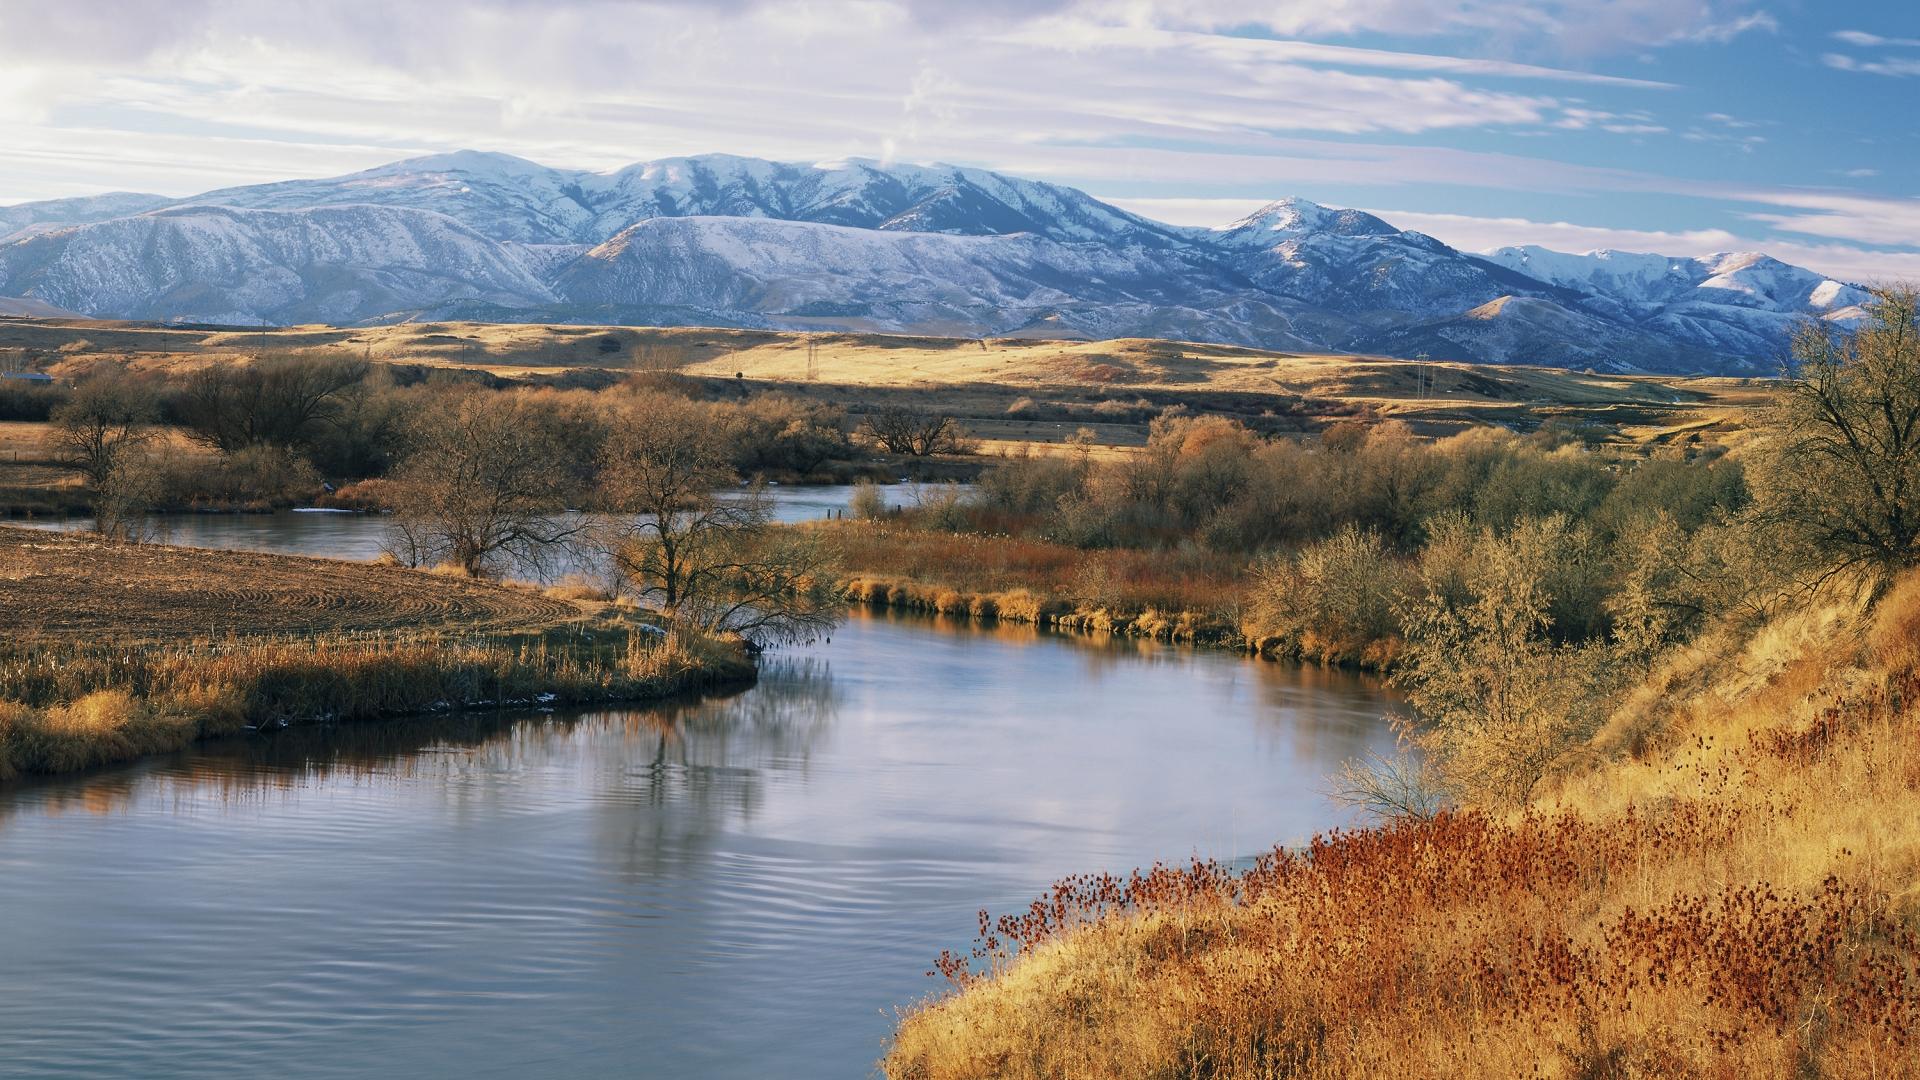 Bear River with Bannock Range in distance near Preston, Idaho. (Credit: Scott Smith/Getty Images)